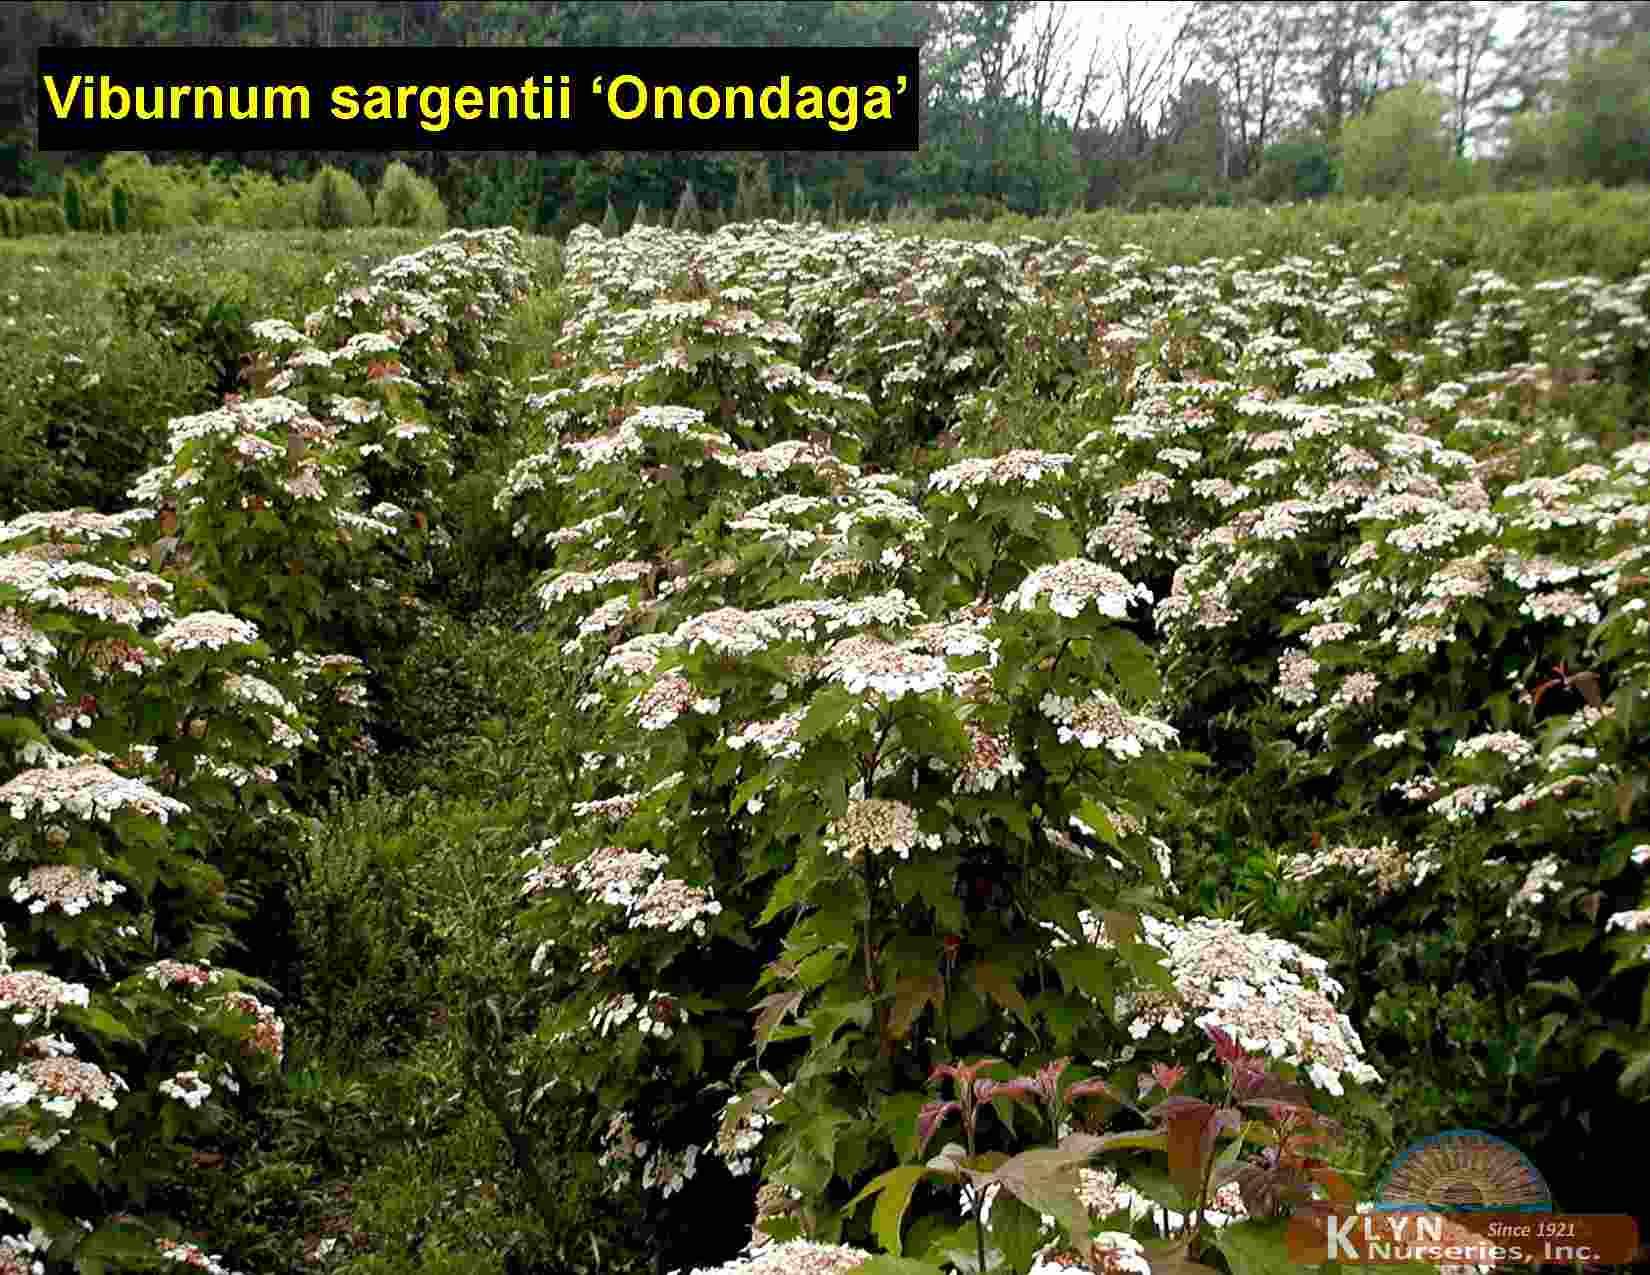 Expandable Tableview Swift Viburnum Sargentii Onondaga Viburnum Sargentii Onondaga